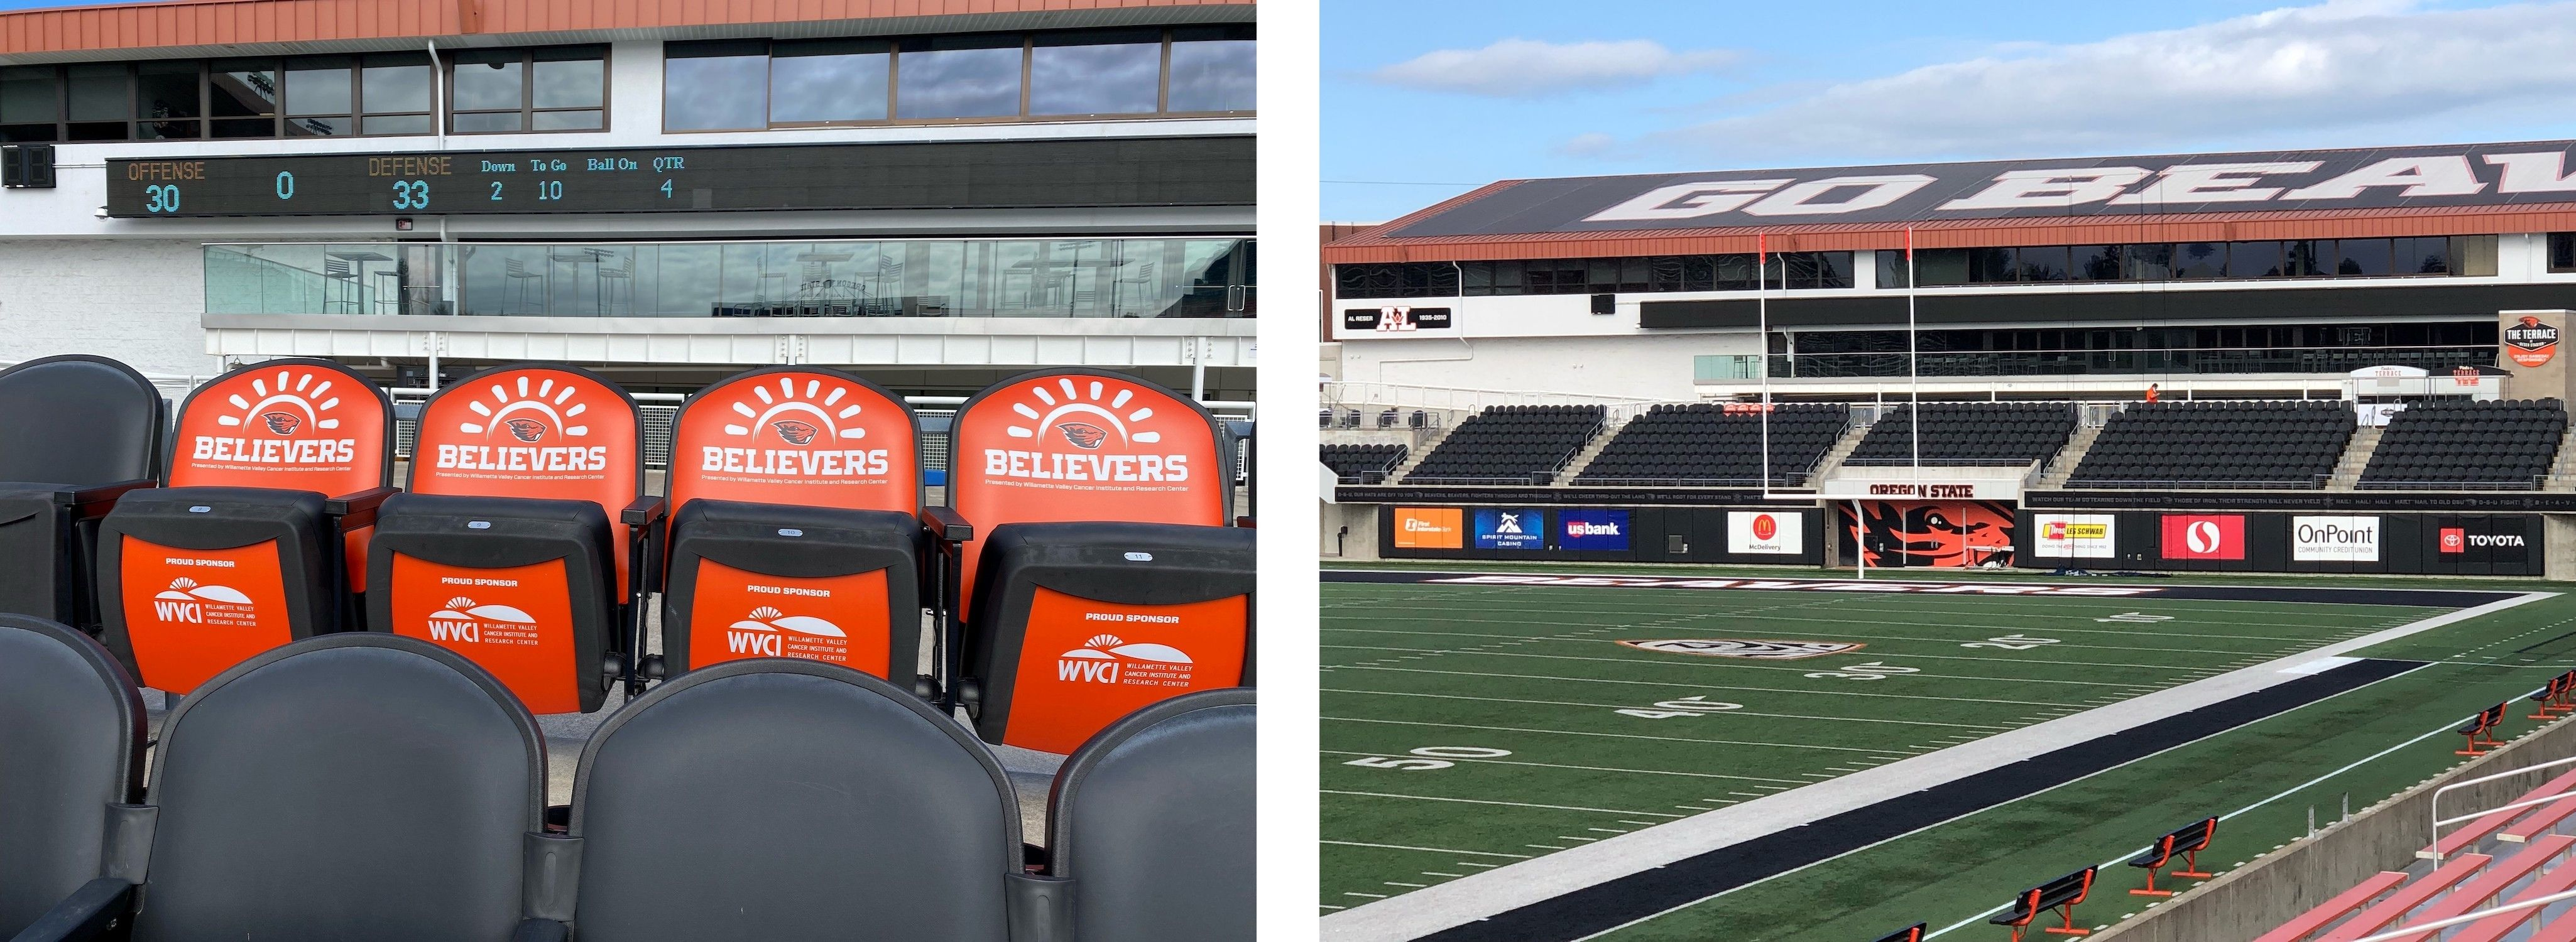 beaver believer program - seats